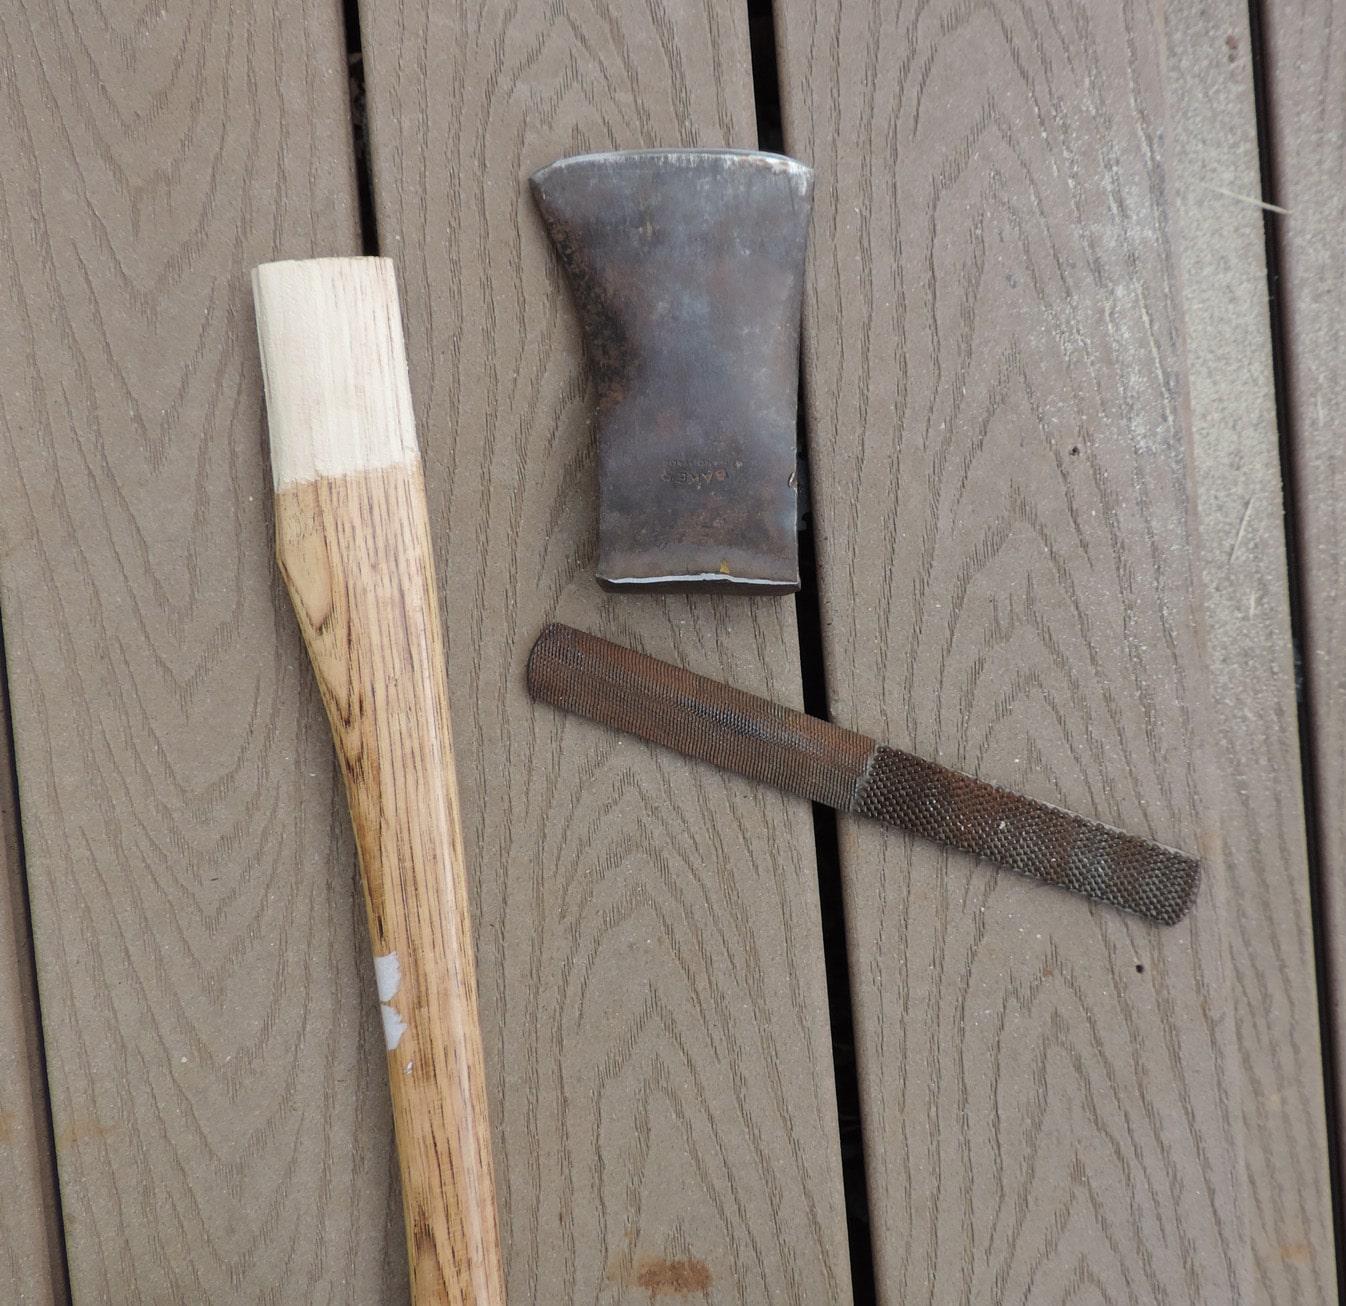 Replacing Axe Handles is an Art - Preparedness AdvicePreparedness Advice